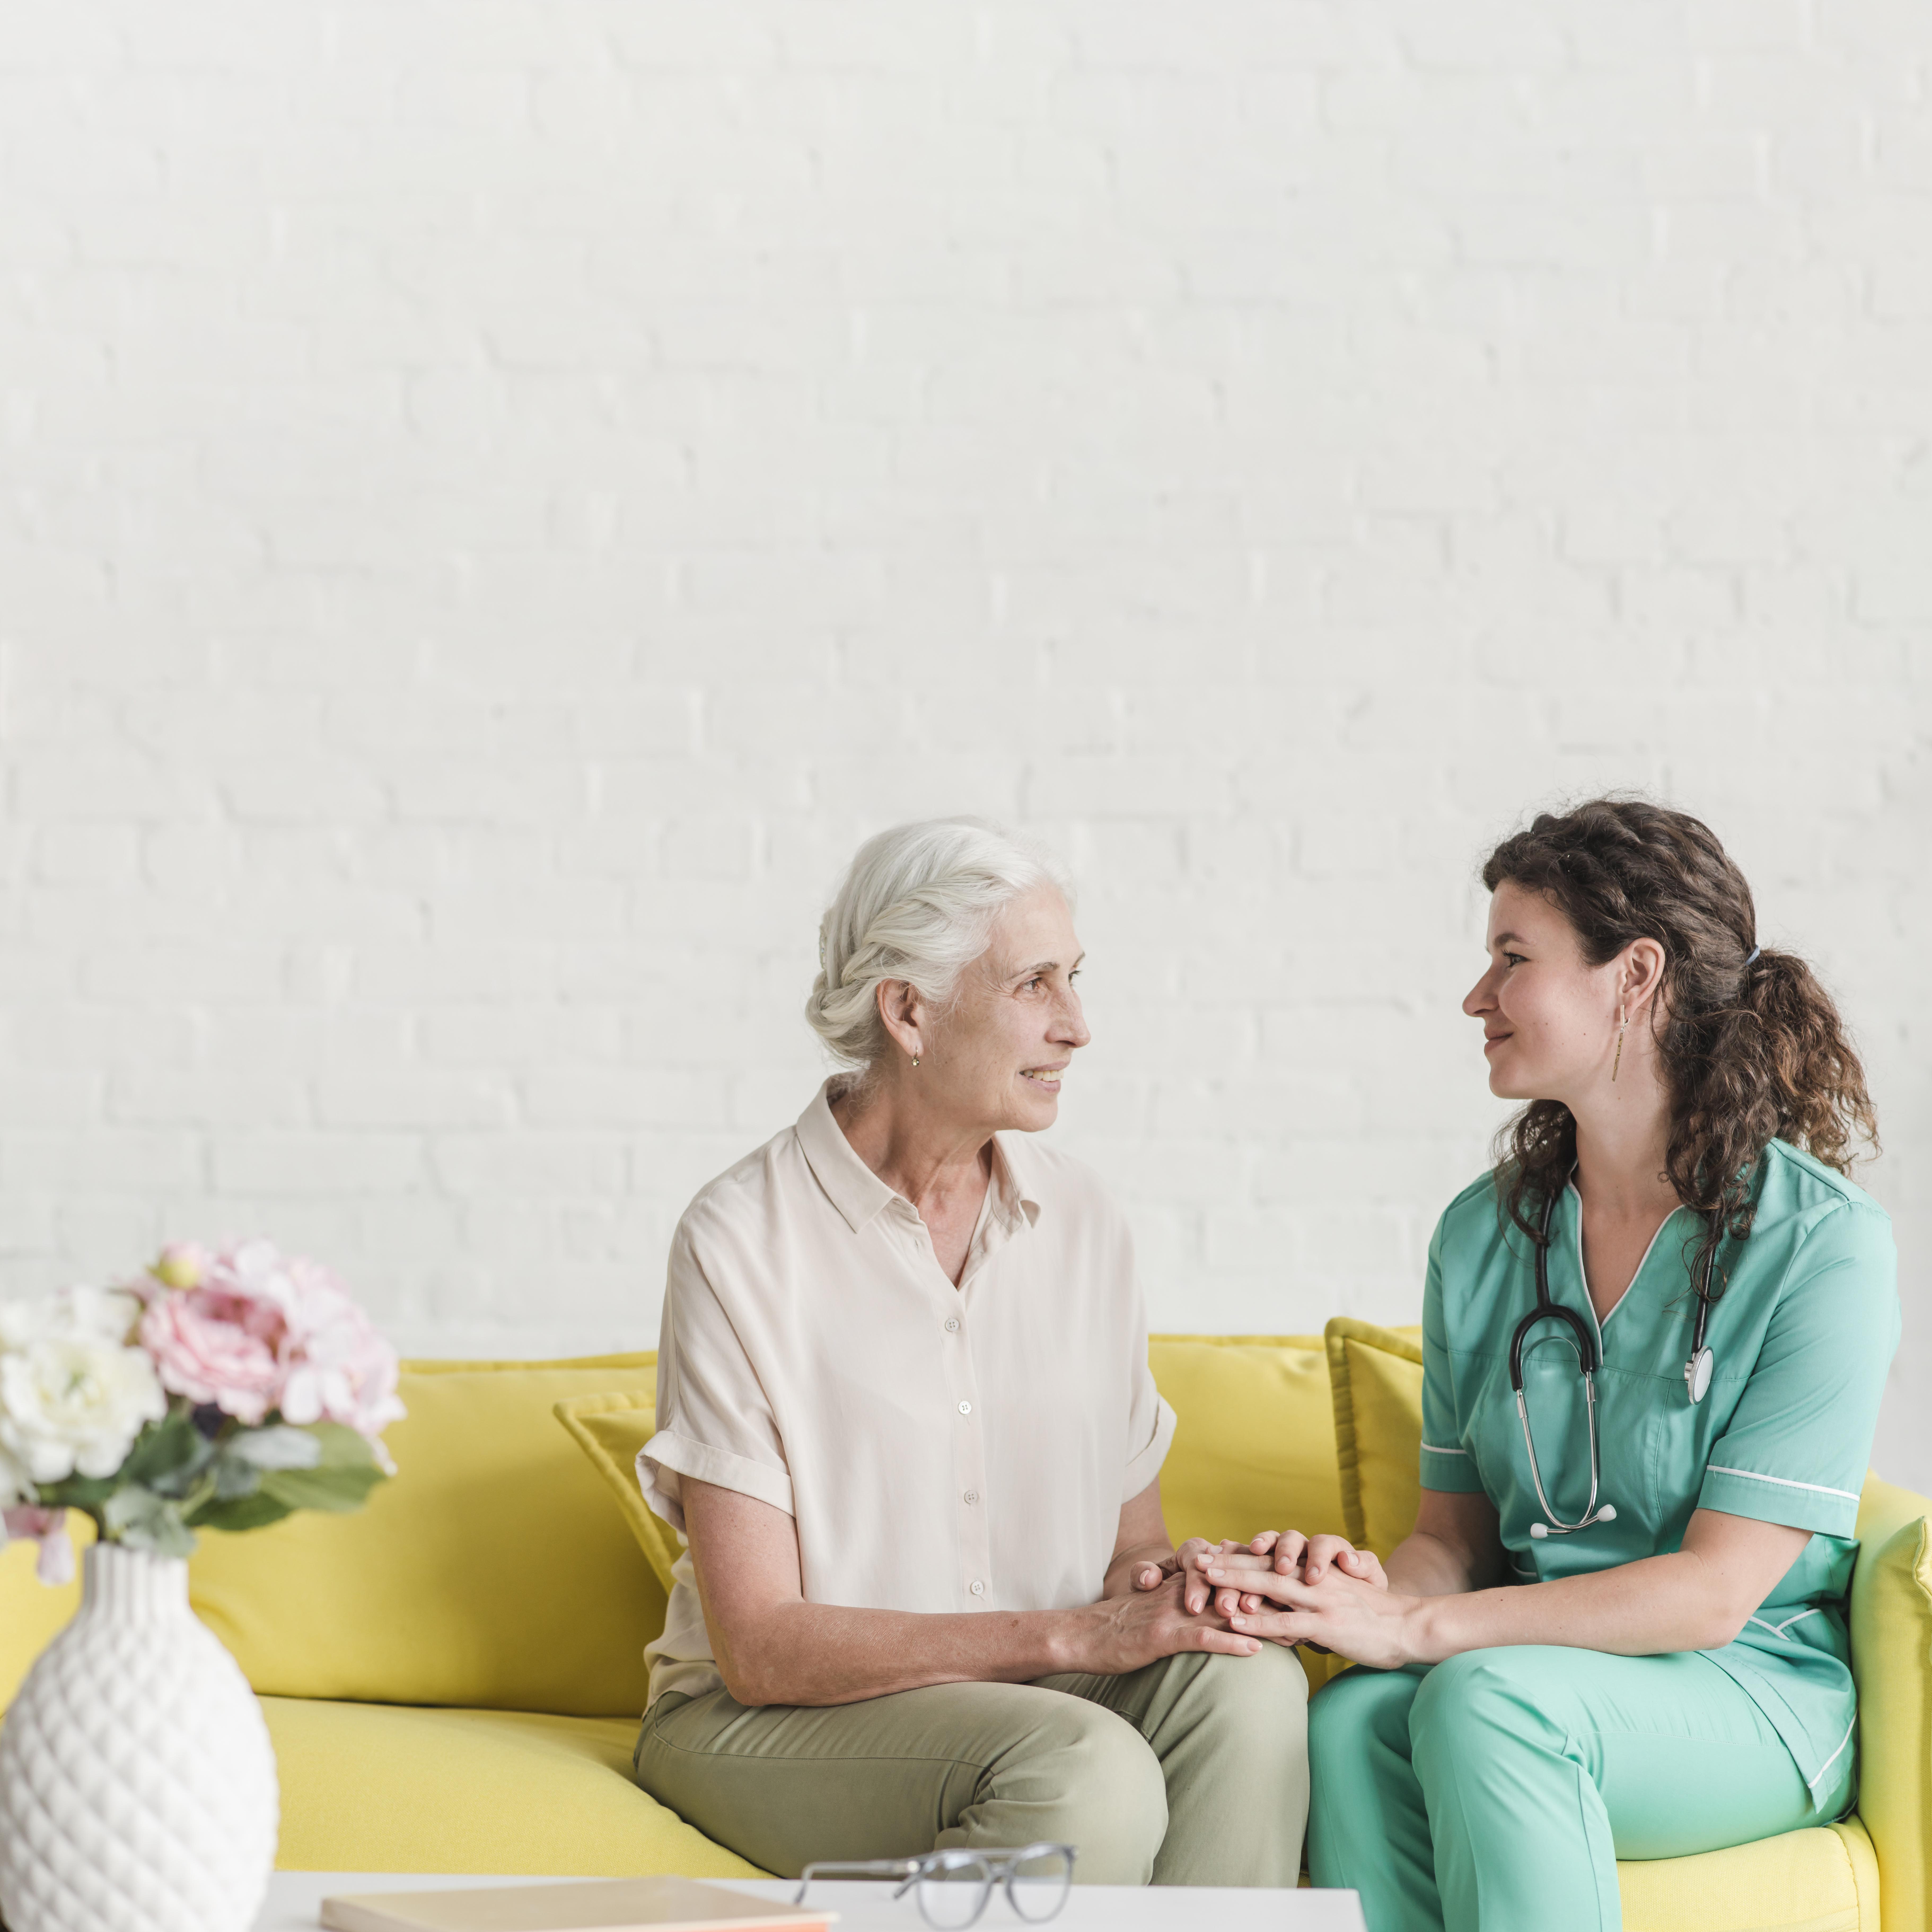 droit photofreepik.comfree-photosmiling-female-senior-patient-and-nurse-holding-each-other-s-hand_2652817.htm'Designed by Freepika.jpg